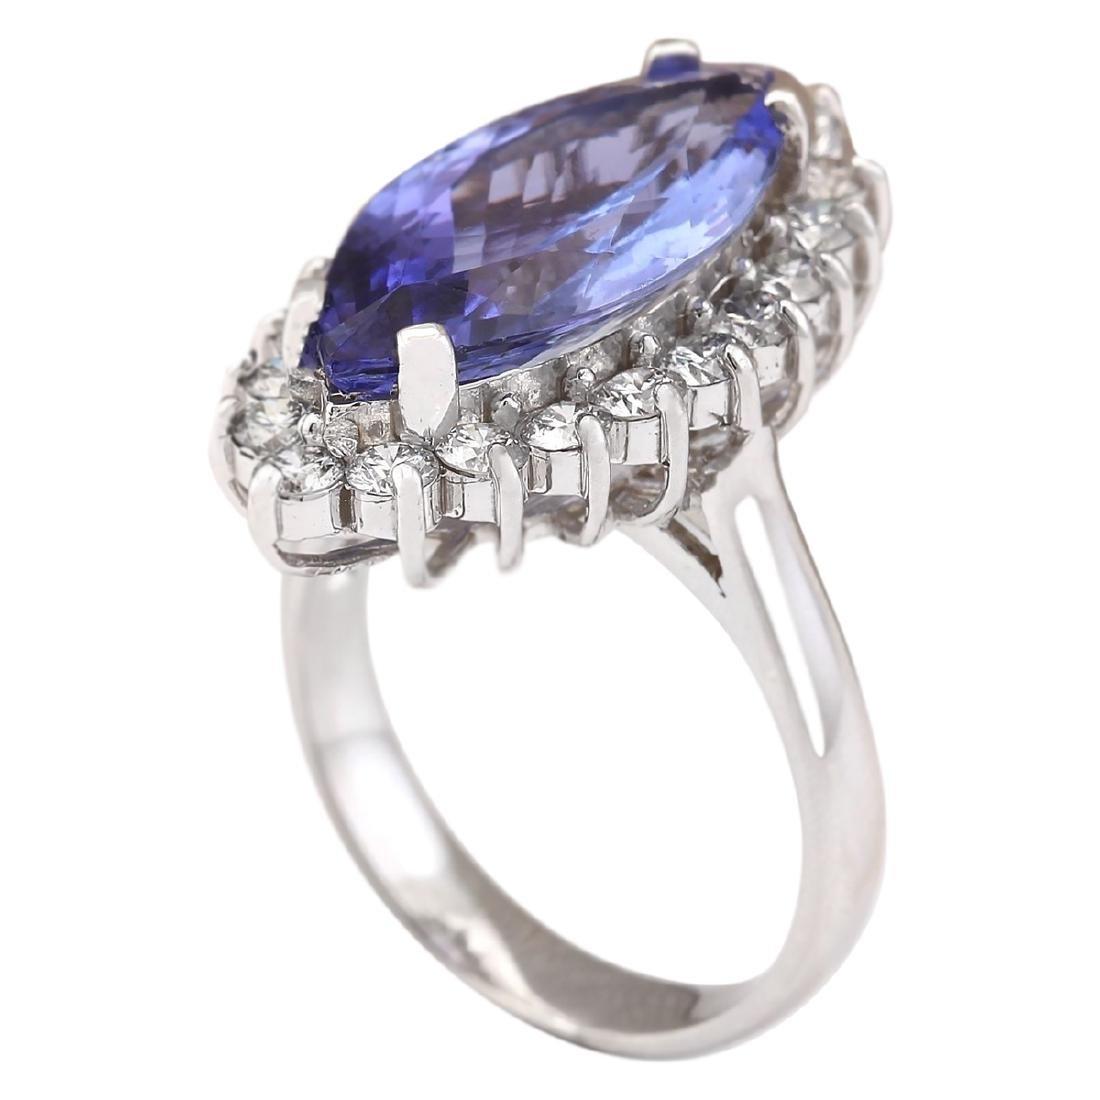 8.80 CTW Natural Blue Tanzanite And Diamond Ring 18K - 3